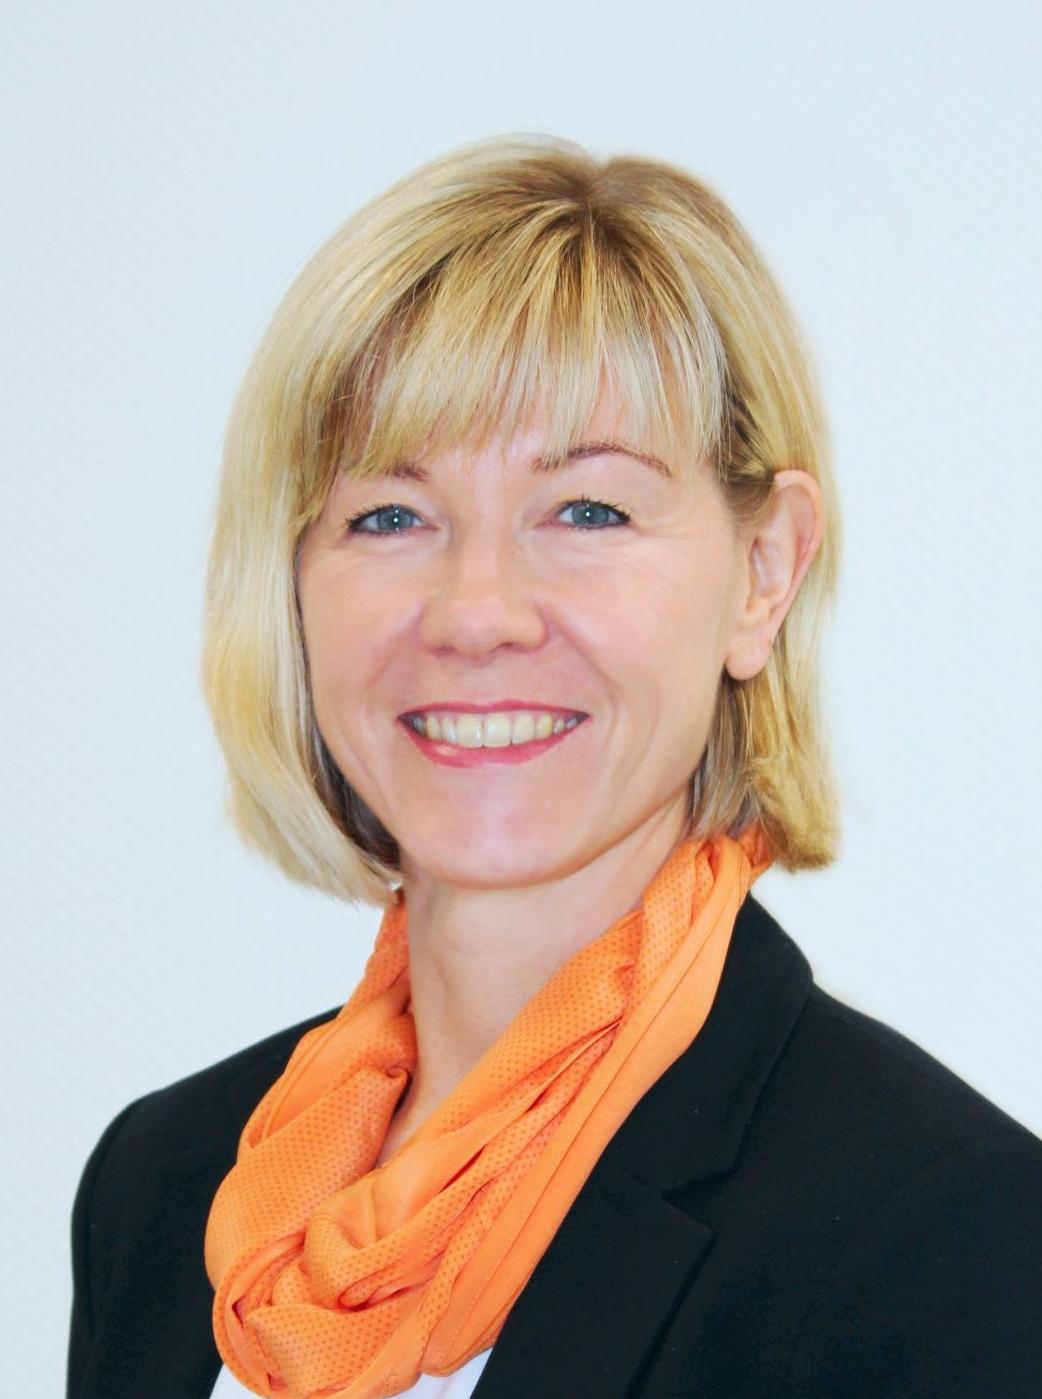 Ansprechpartner Filiale Crivitz - Raiffeisenbank eG Hagenow